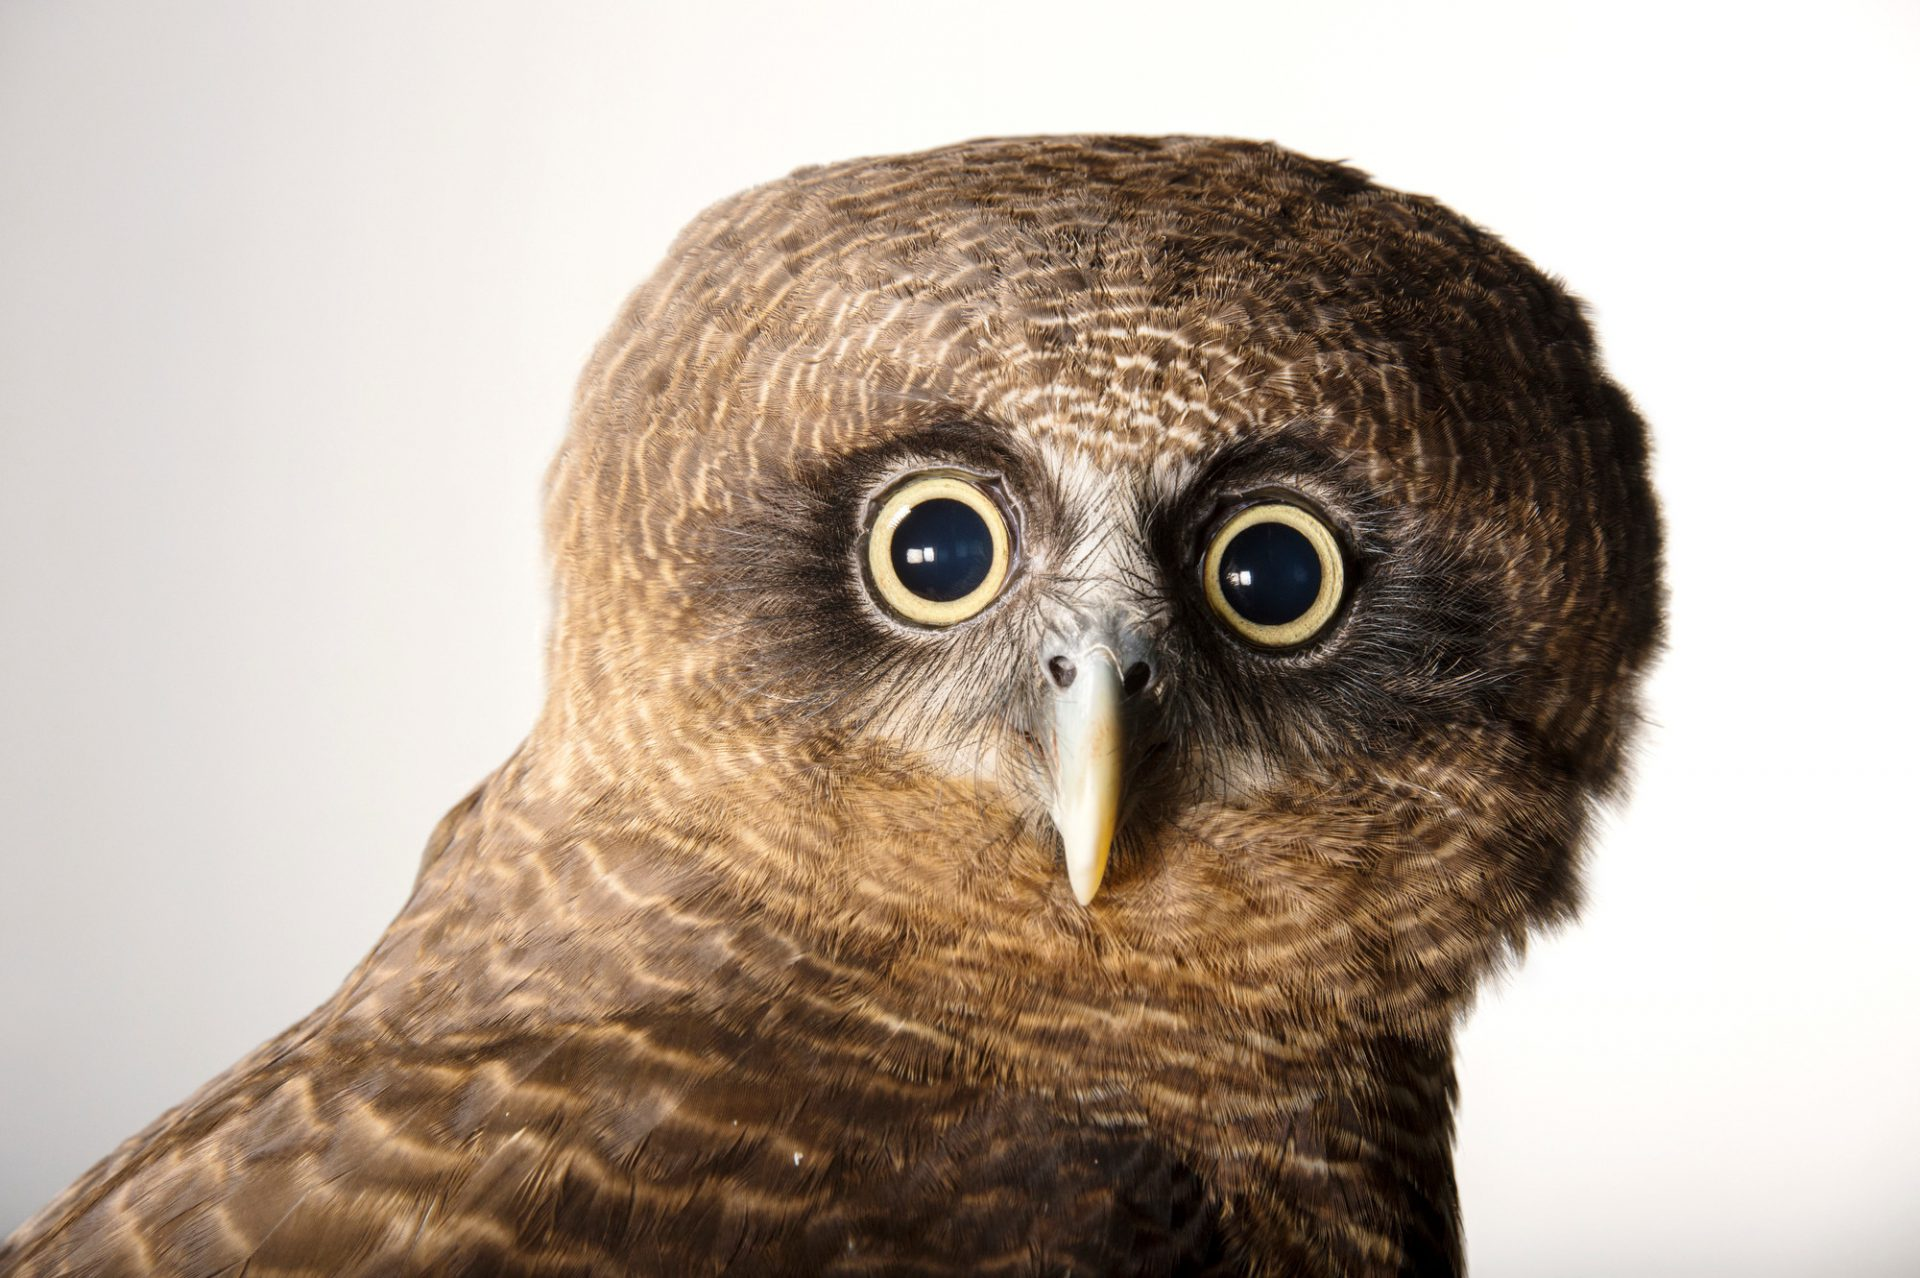 Picture of a rufous owl (Ninox rufa) named Angus at the Taronga Zoo in Sydney, Australia.